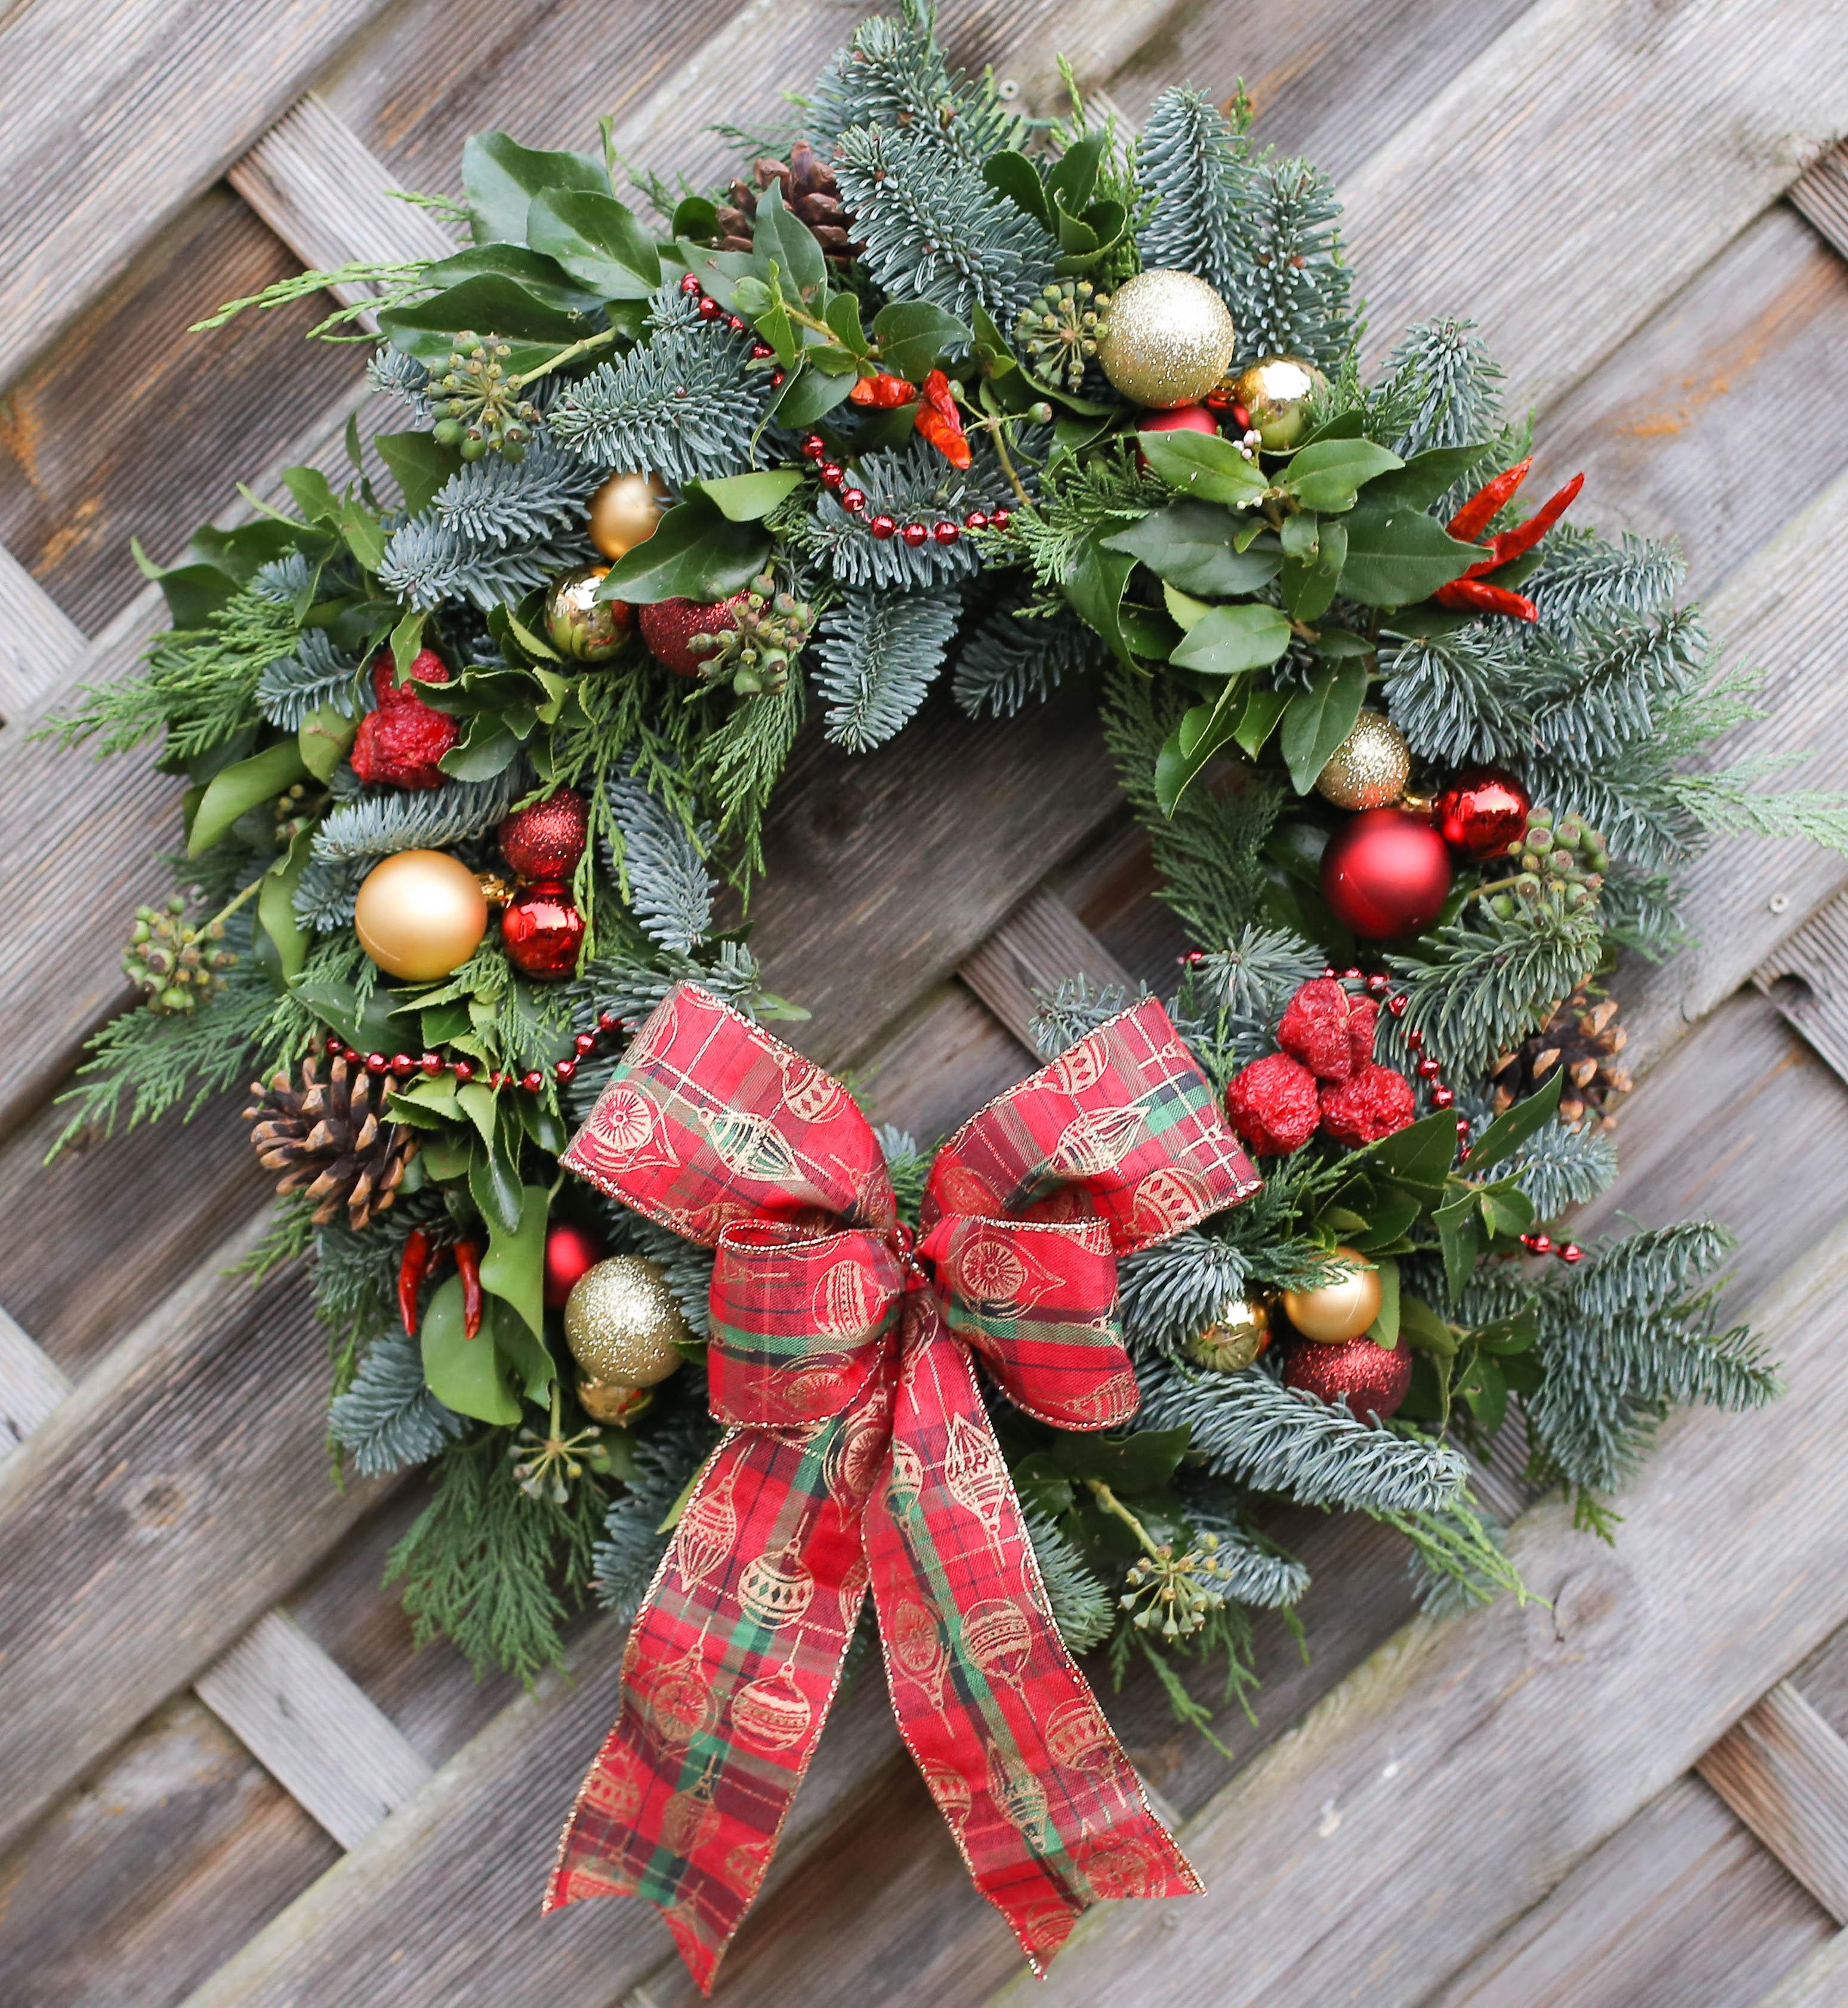 Making Christmas.Christmas Wreath And Garland Making Workshops